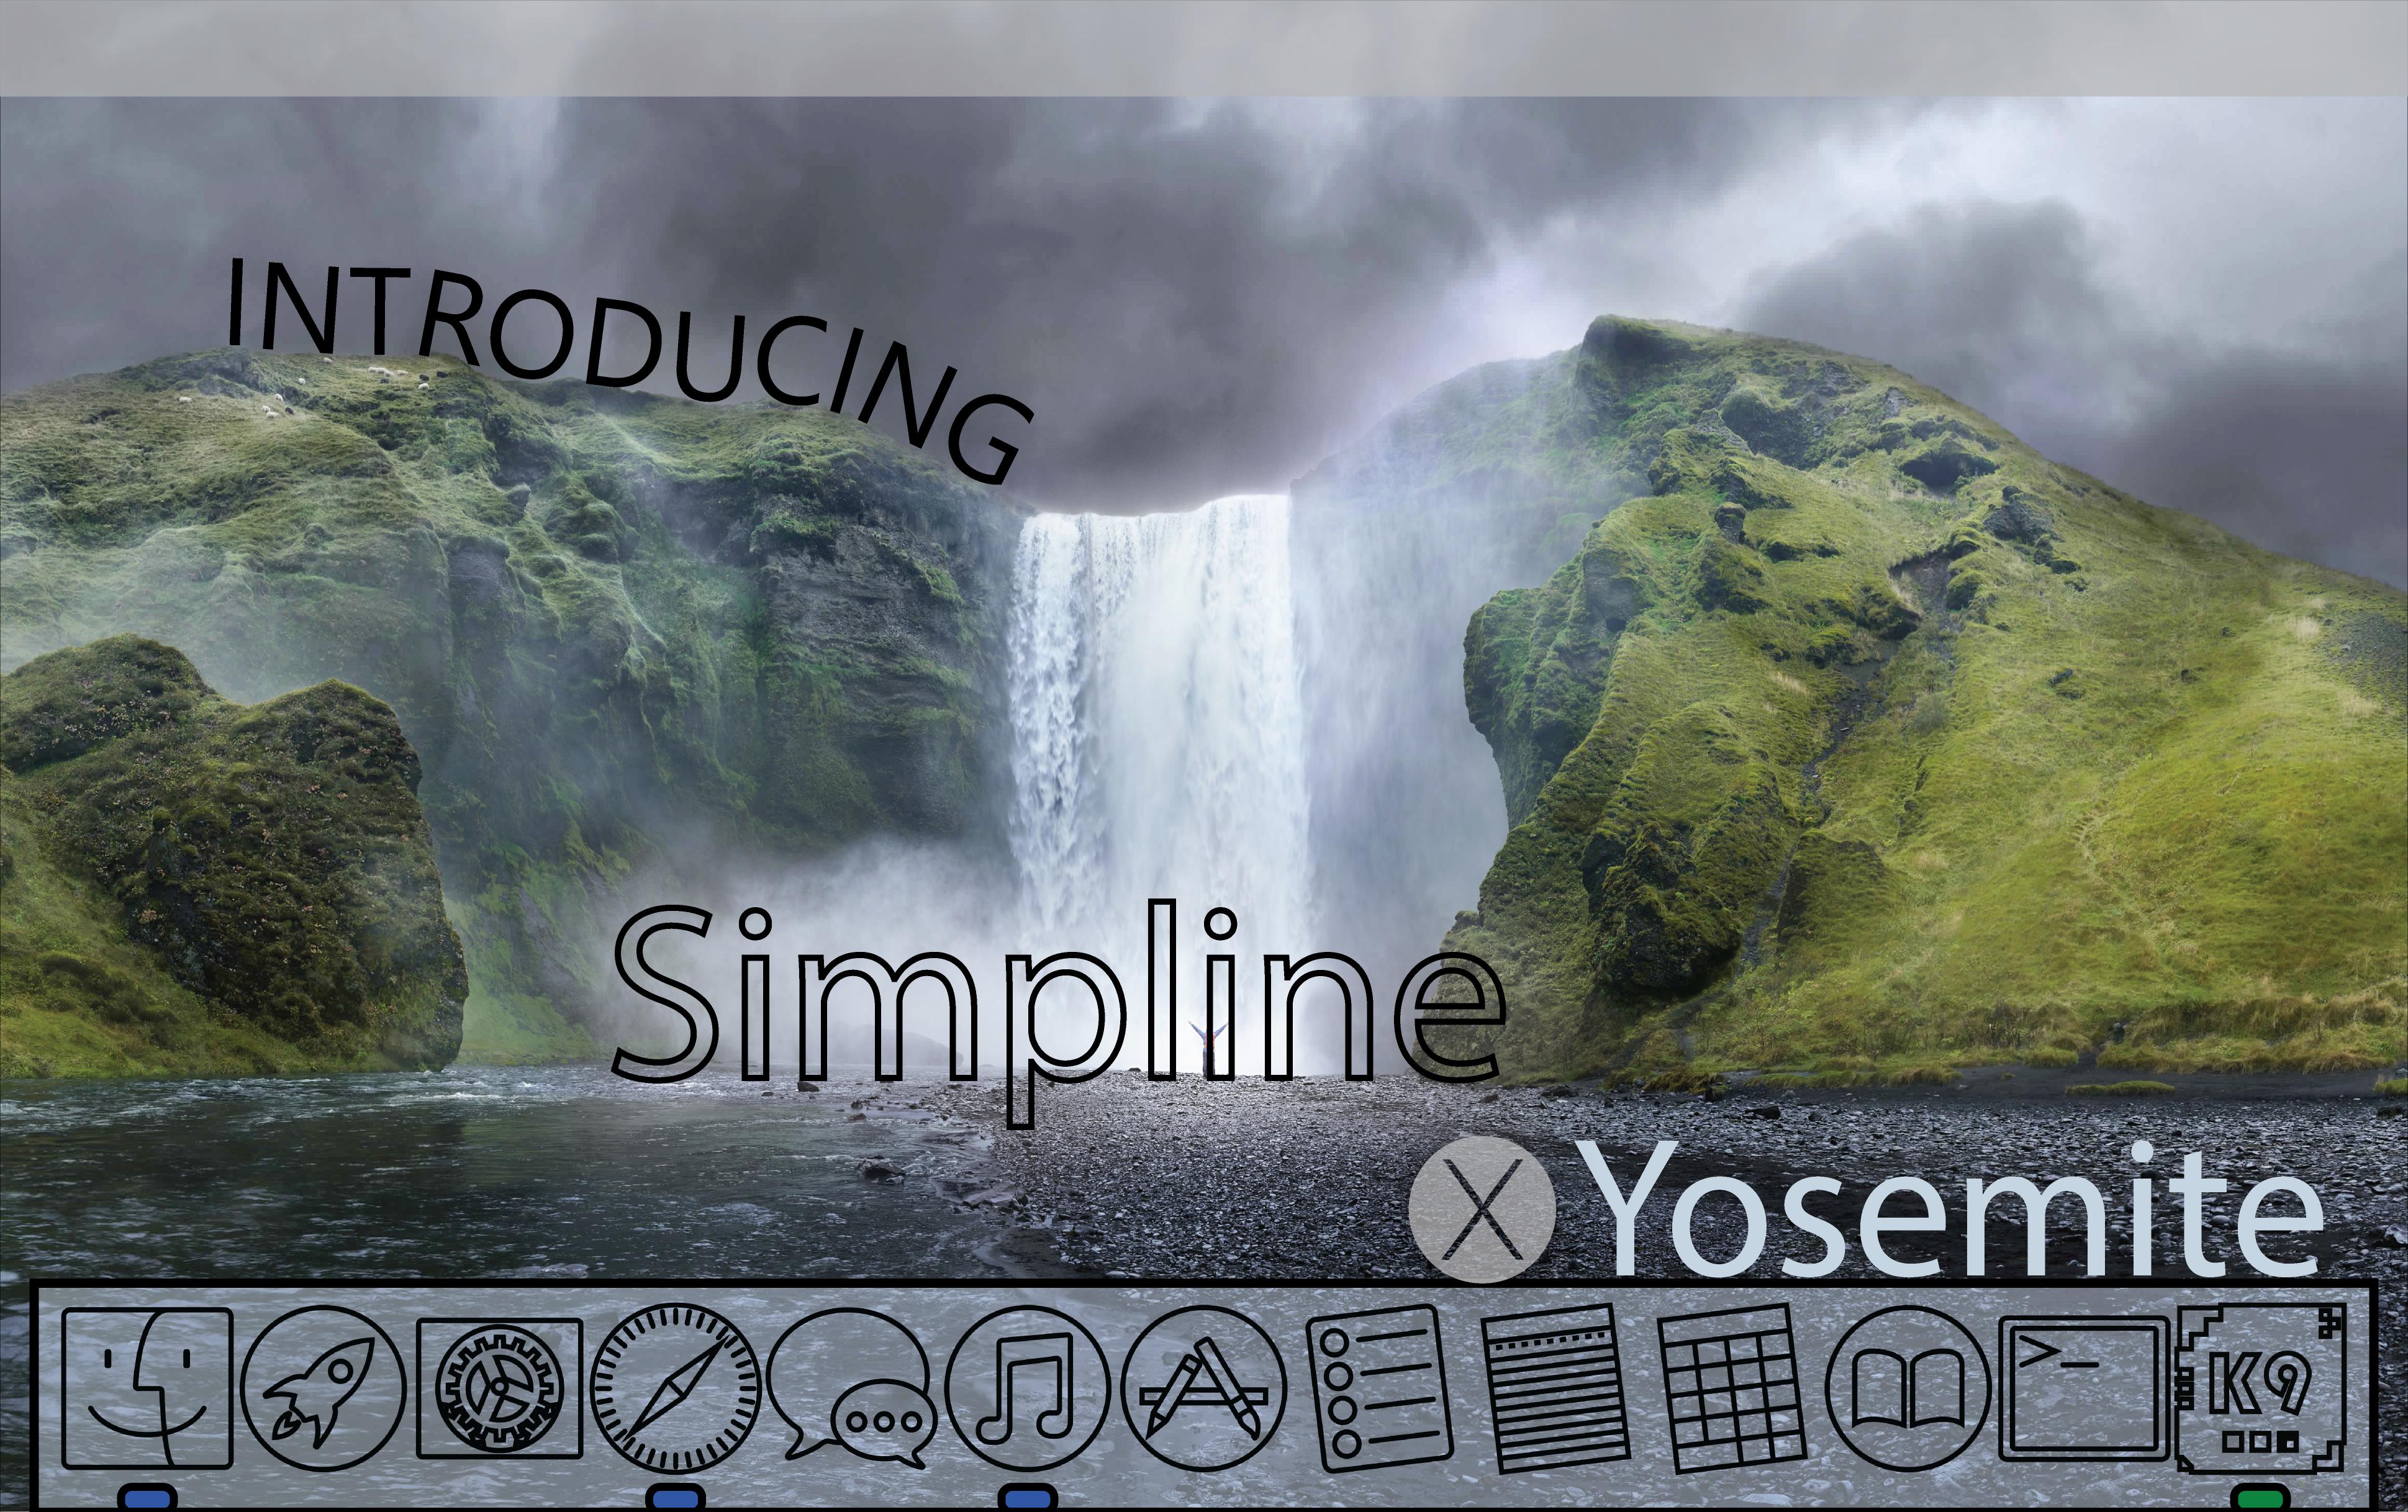 SIMPLINE ICON SET OS X Yosemite - Coming Soon?